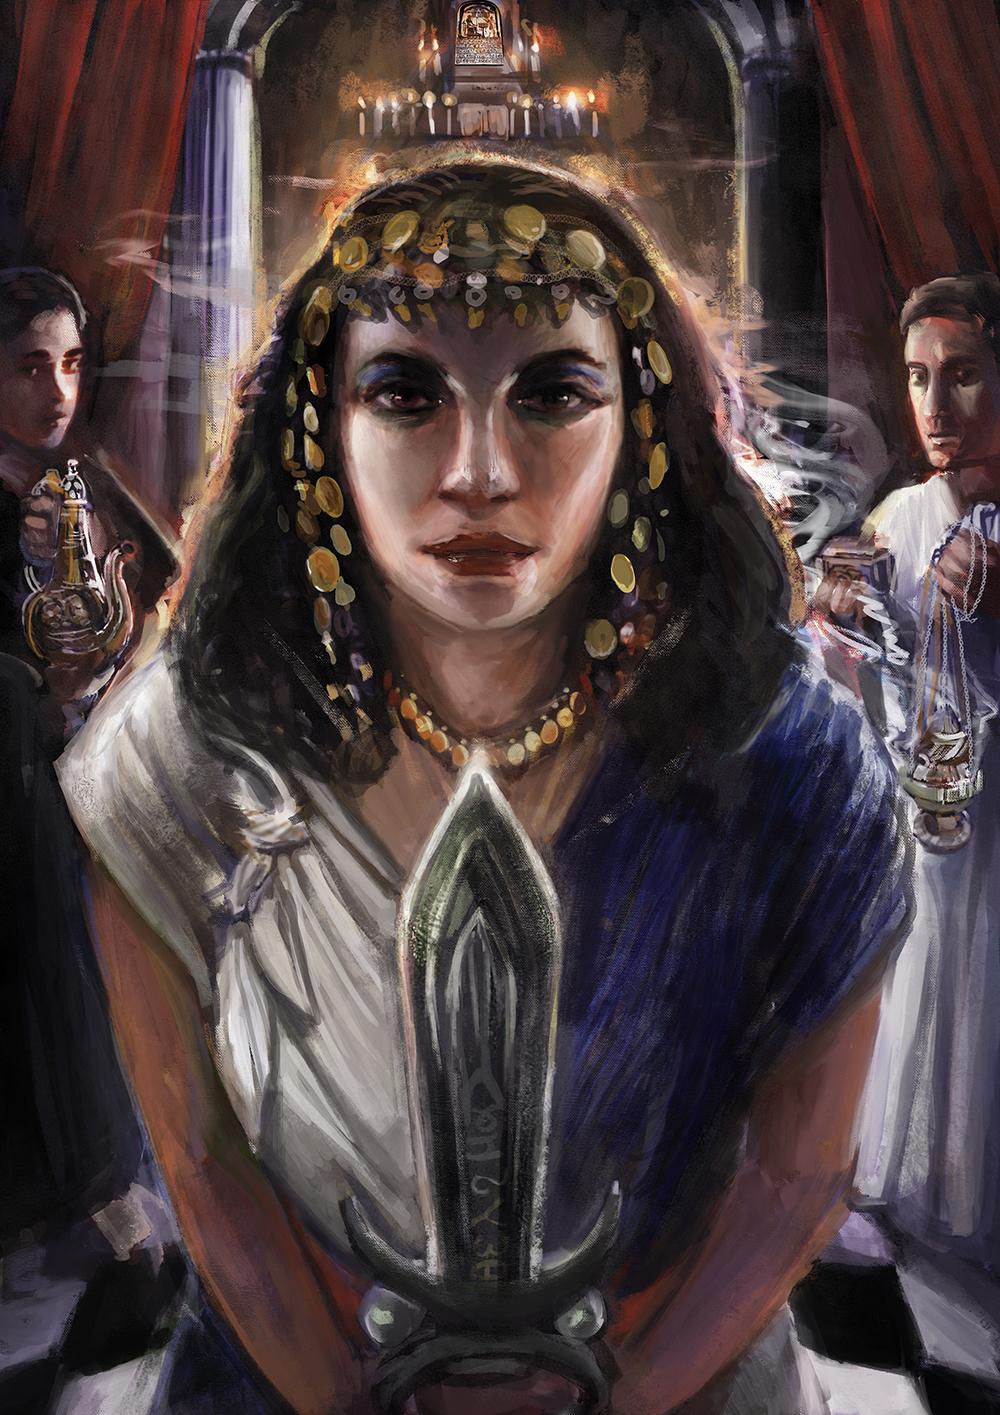 The Initiatrix